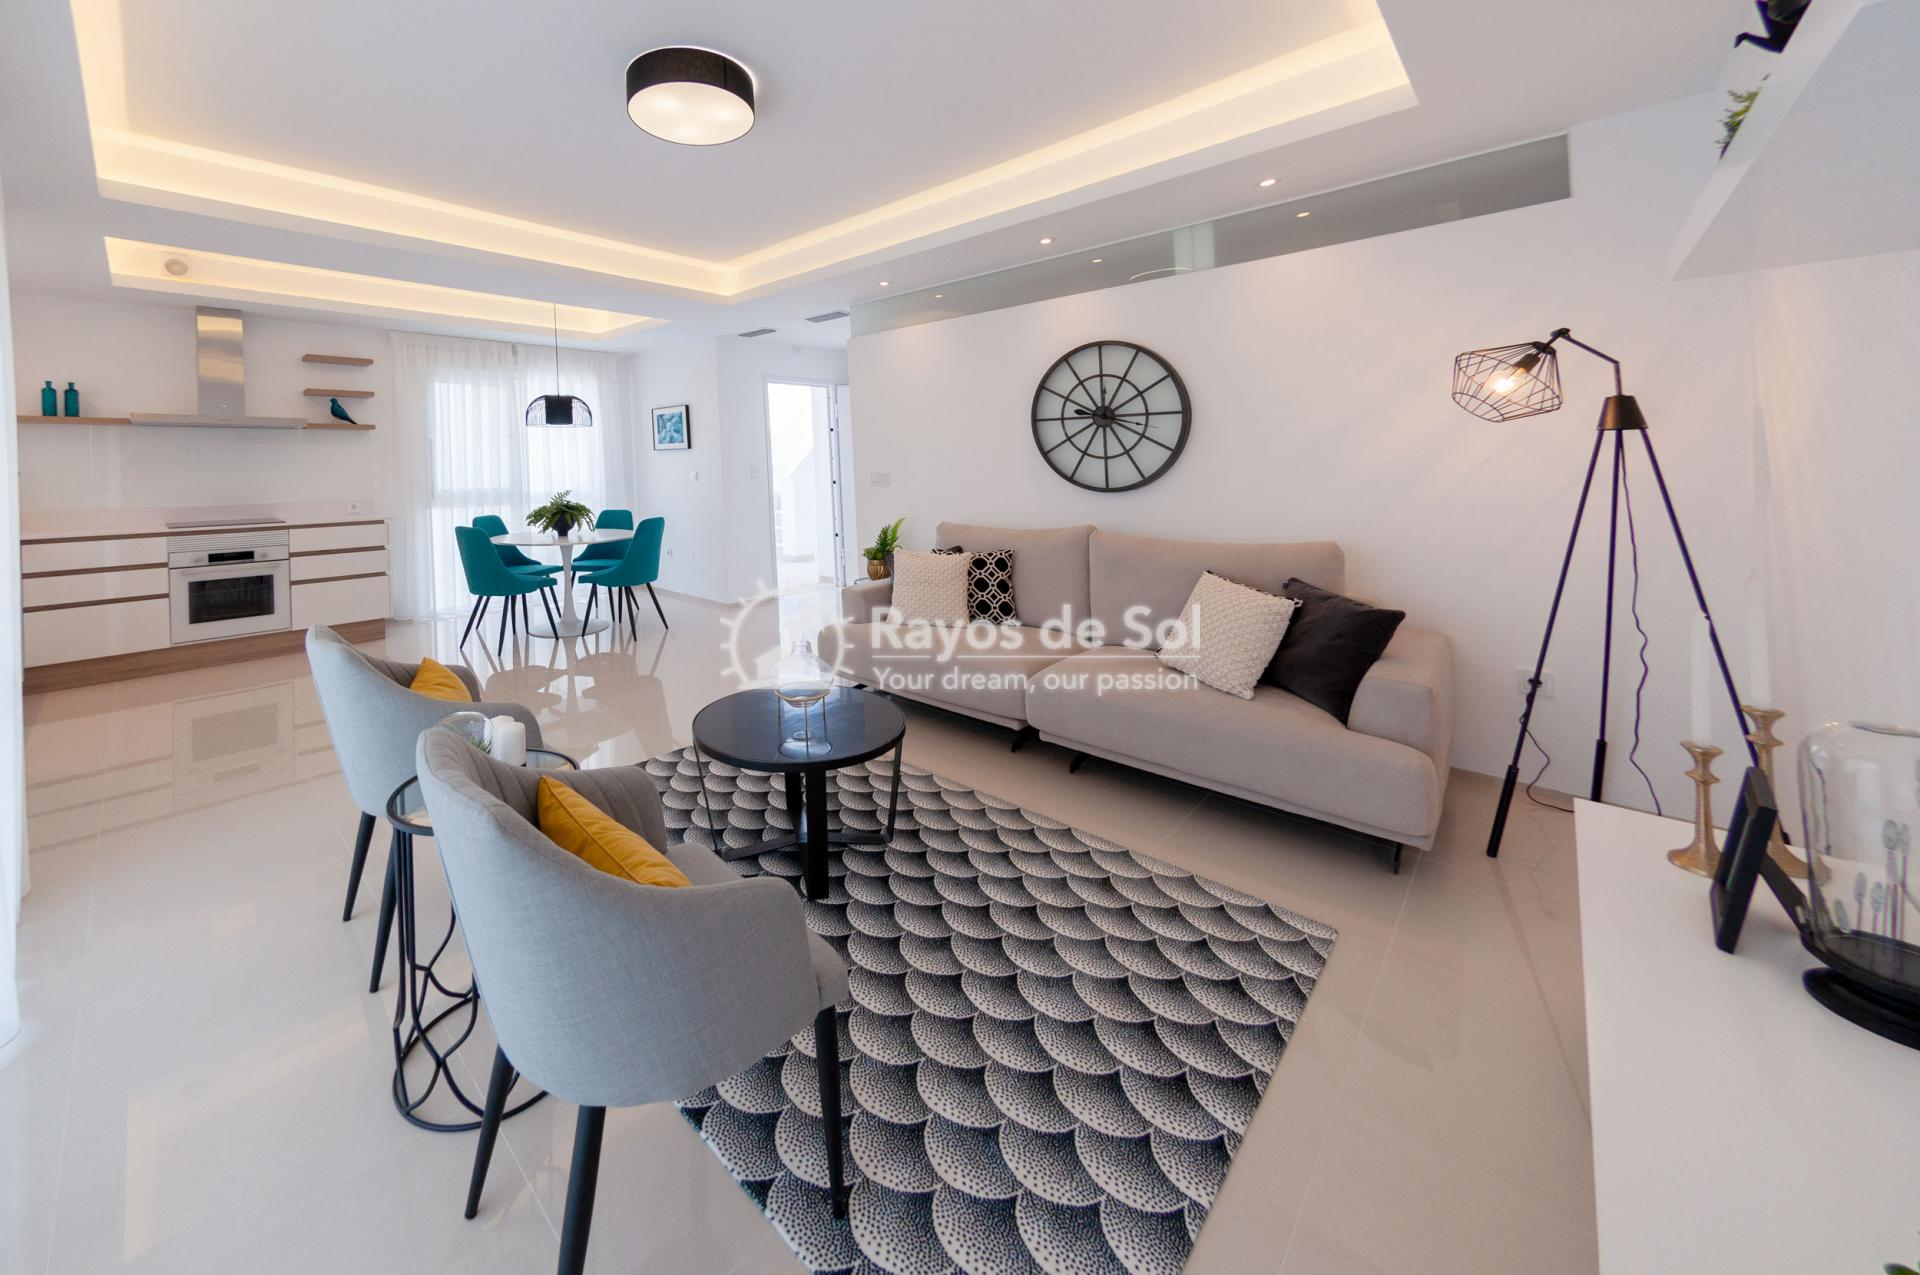 Ground floor apartment  in Doña Pepa, Ciudad Quesada, Costa Blanca (Fortuna-olivos-BG2) - 4